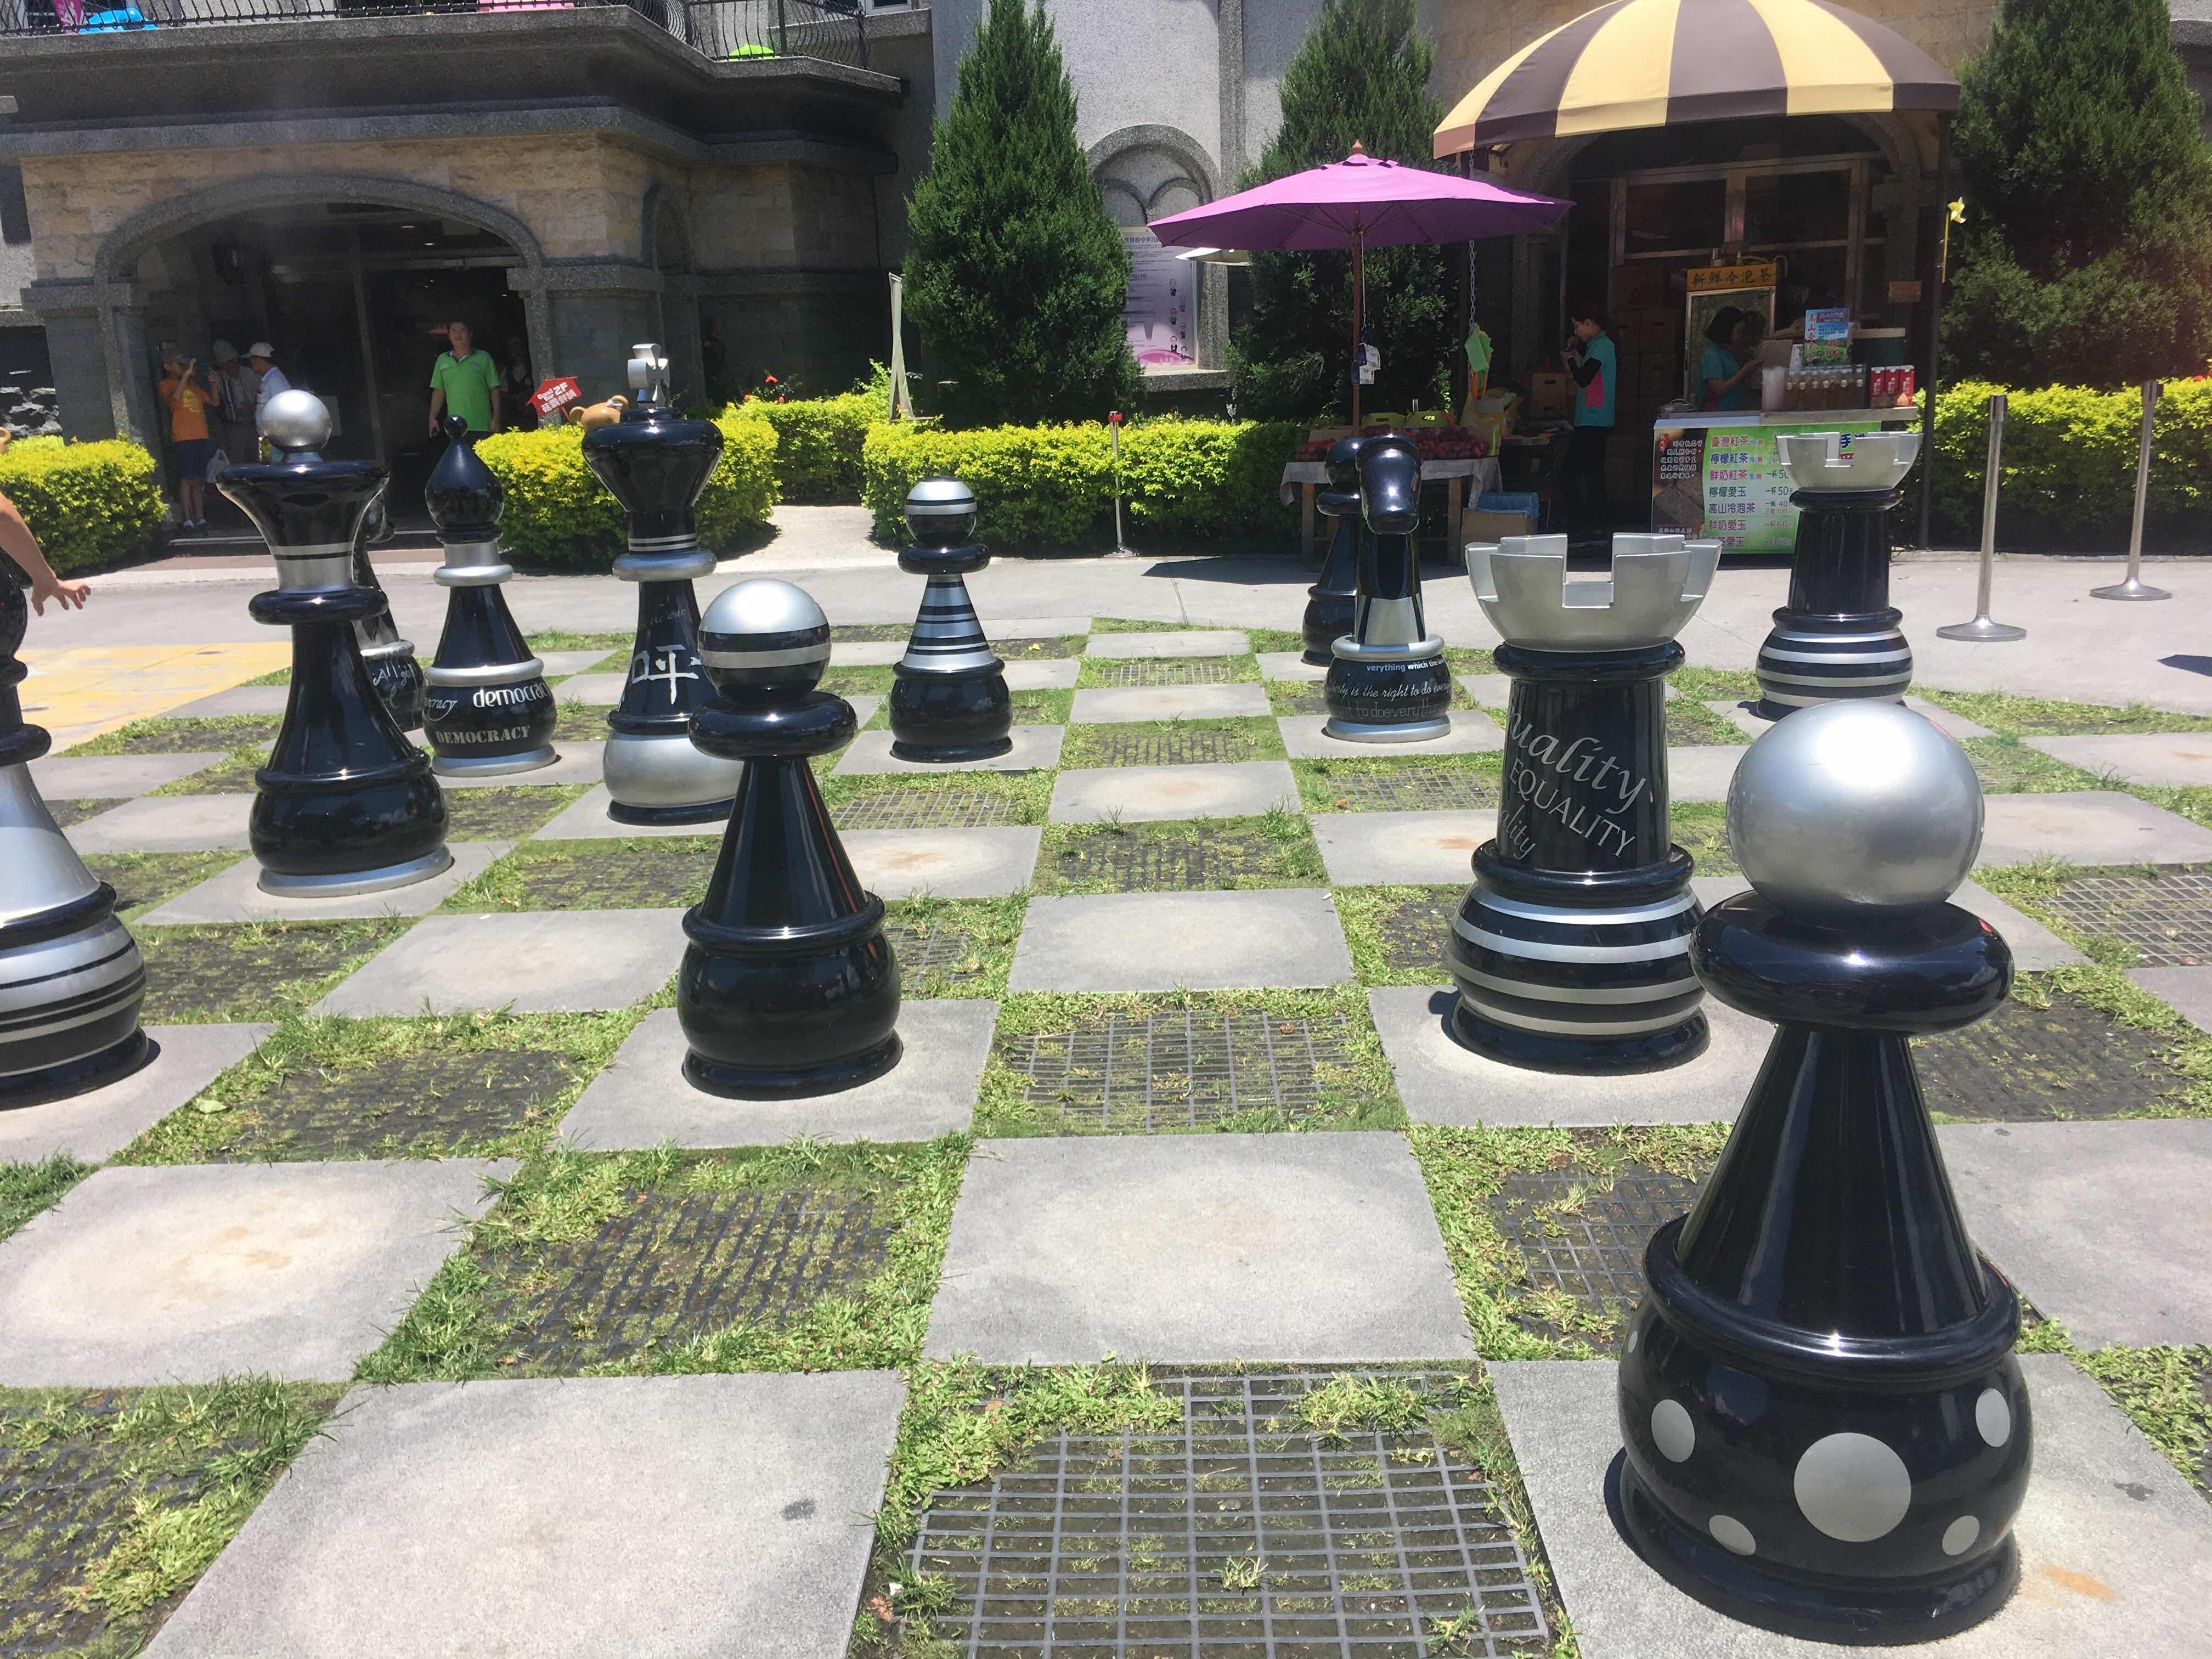 king's garden castle themed bakery puli nantou Taiwan